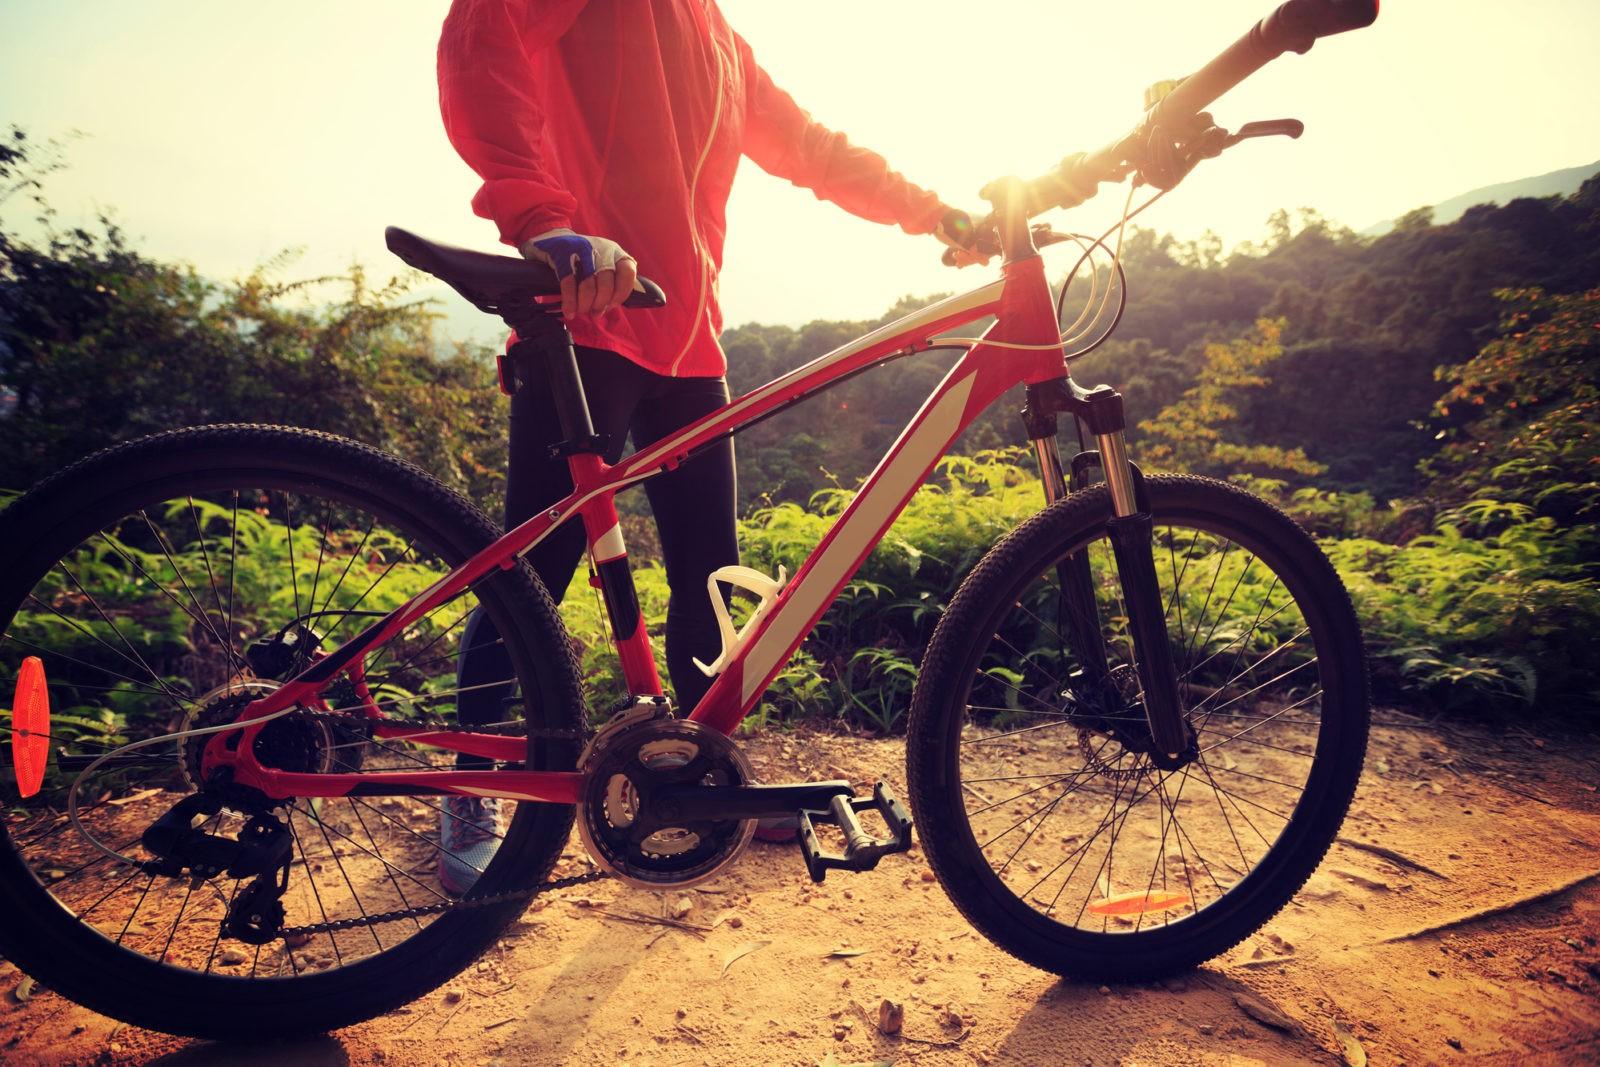 Holding a mountain bike